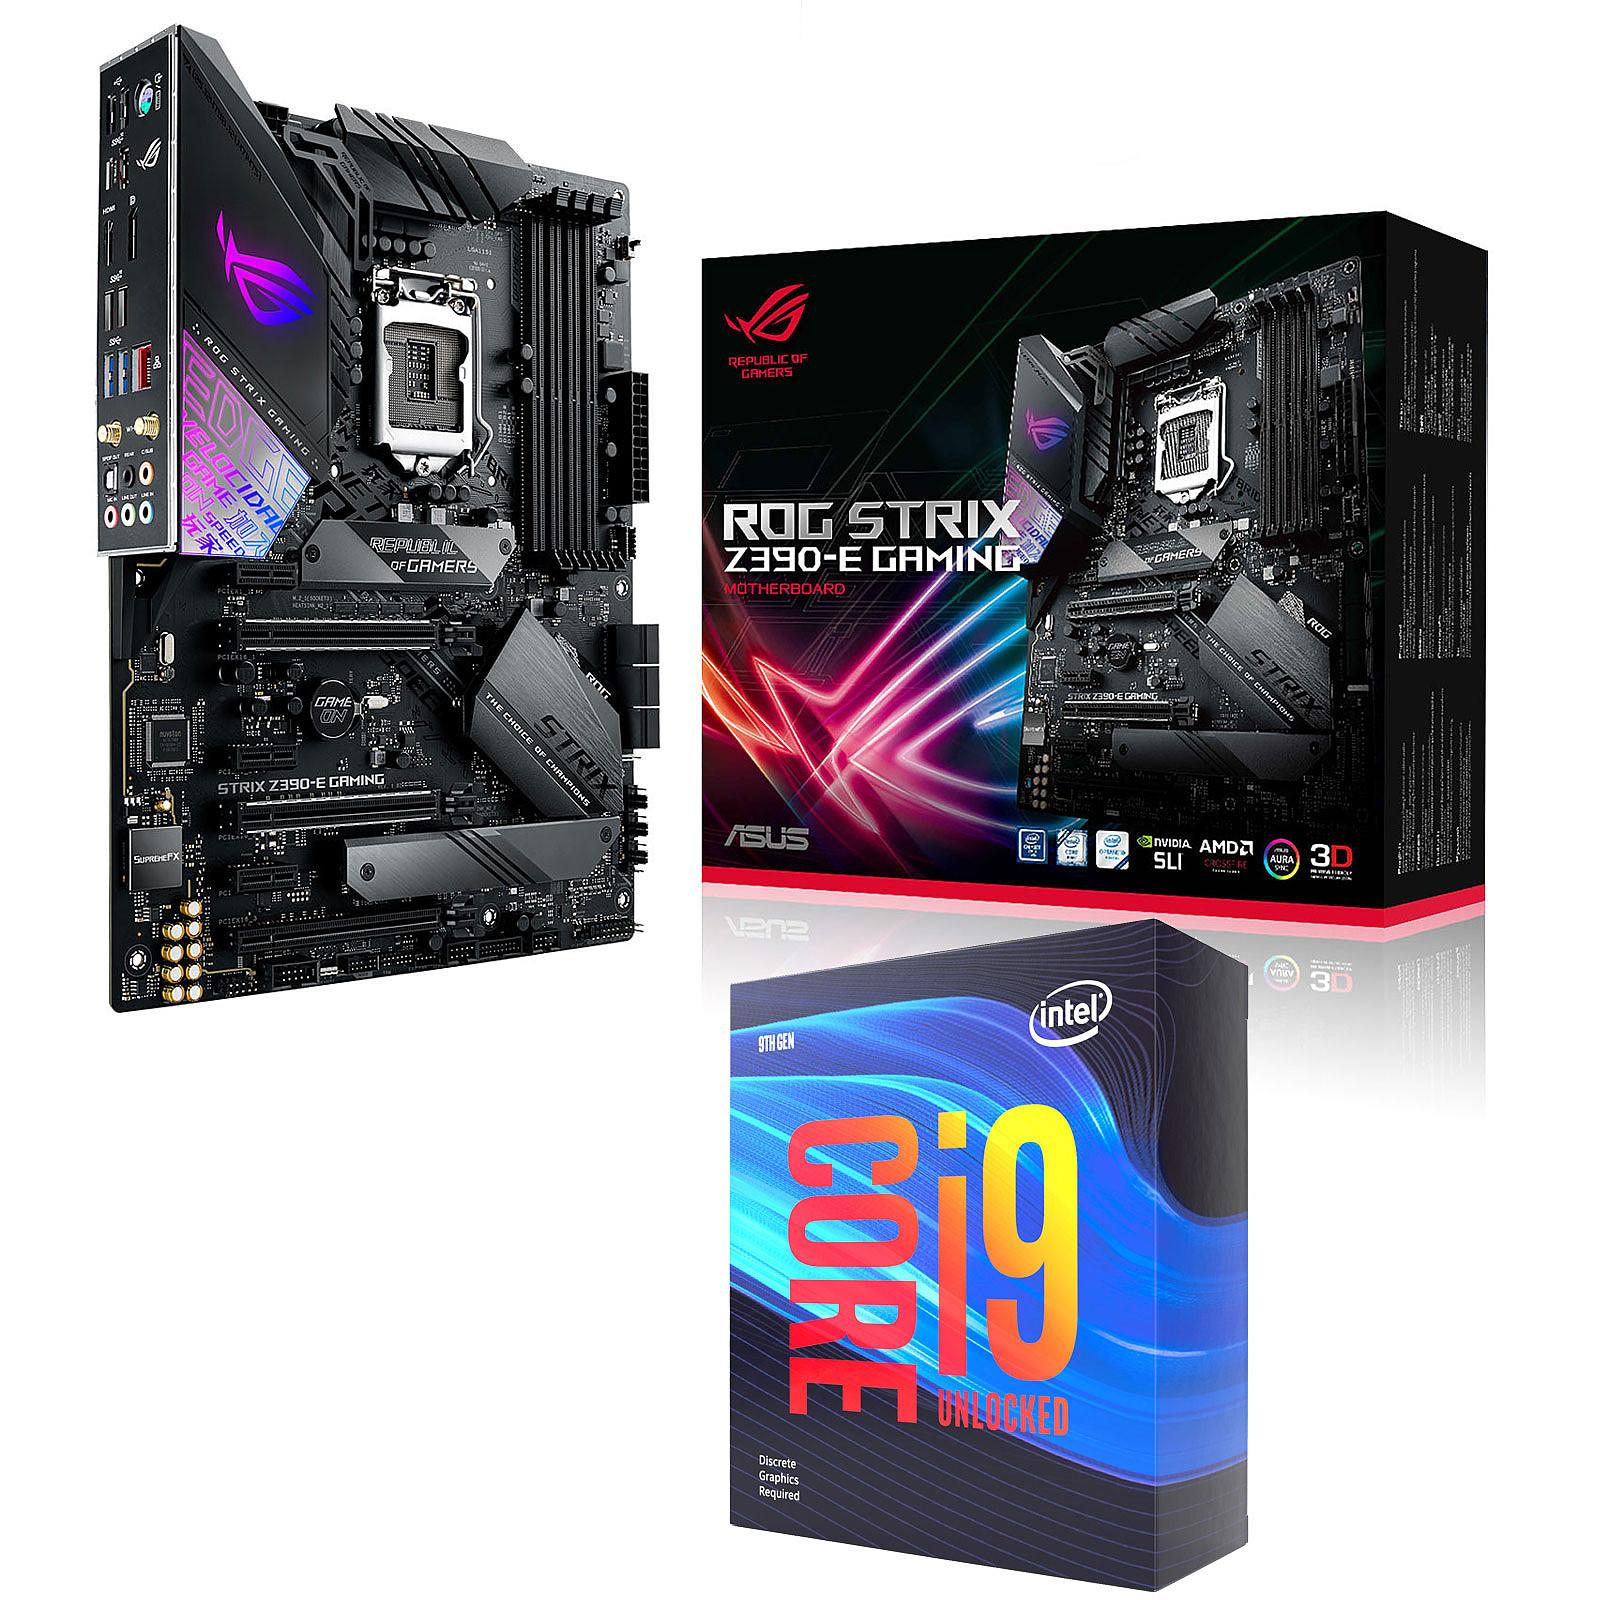 Kit Upgrade PC Core i9KF ASUS ROG STRIX Z390-E GAMING